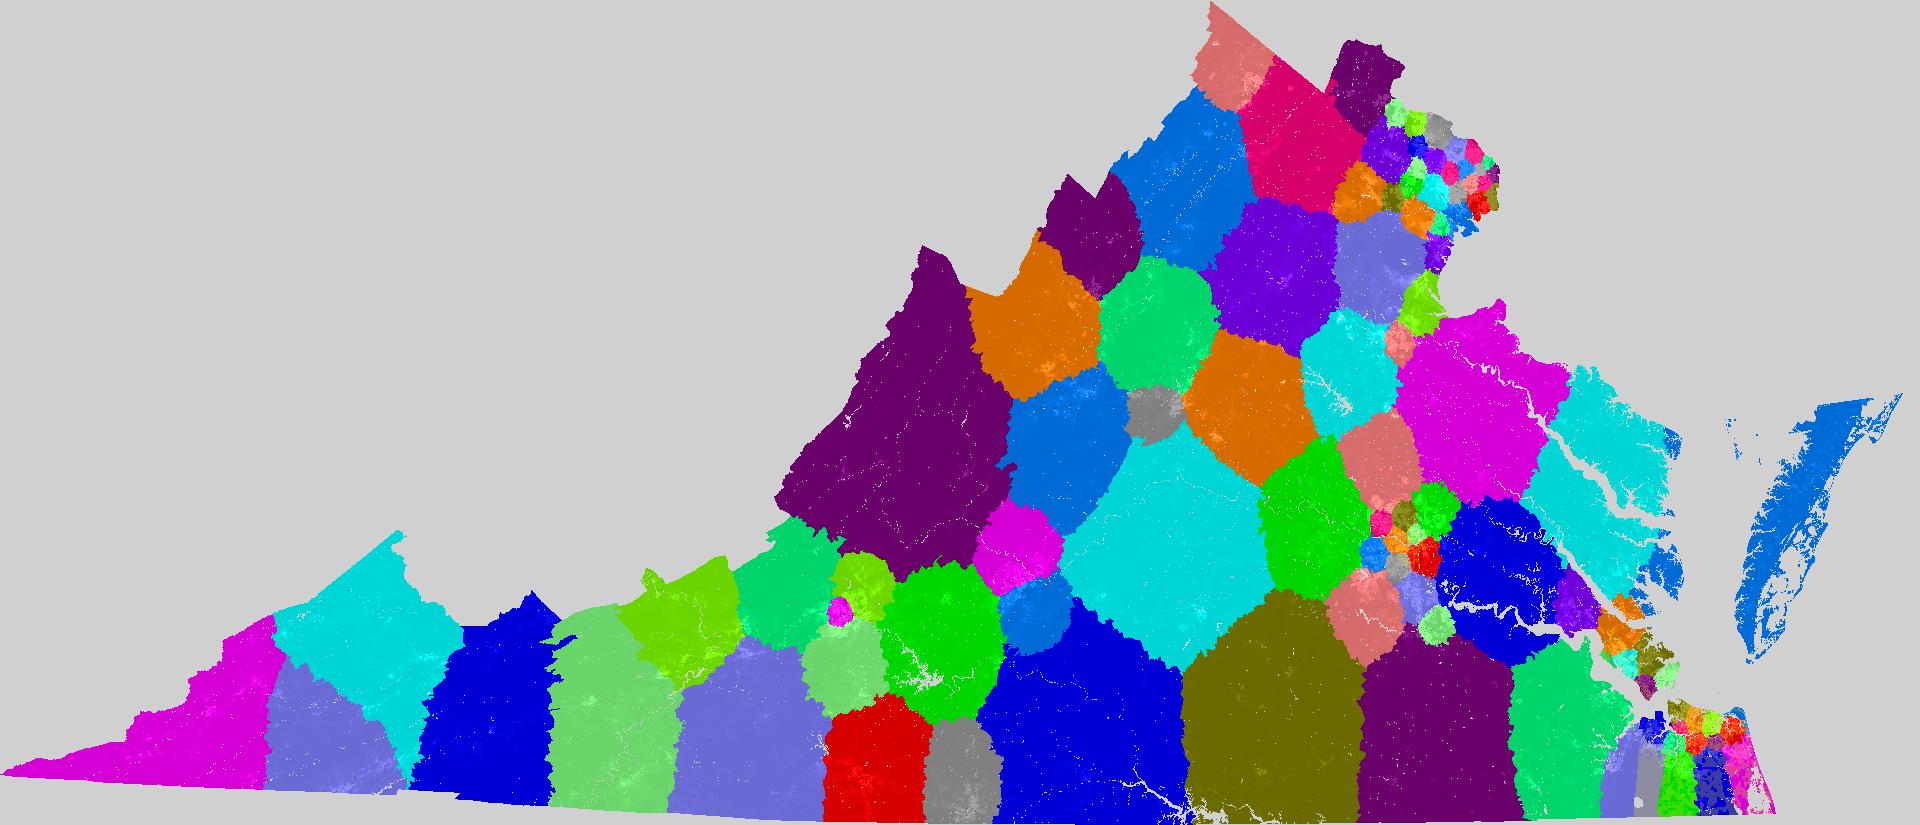 Virginia House Of Delegates Redistricting